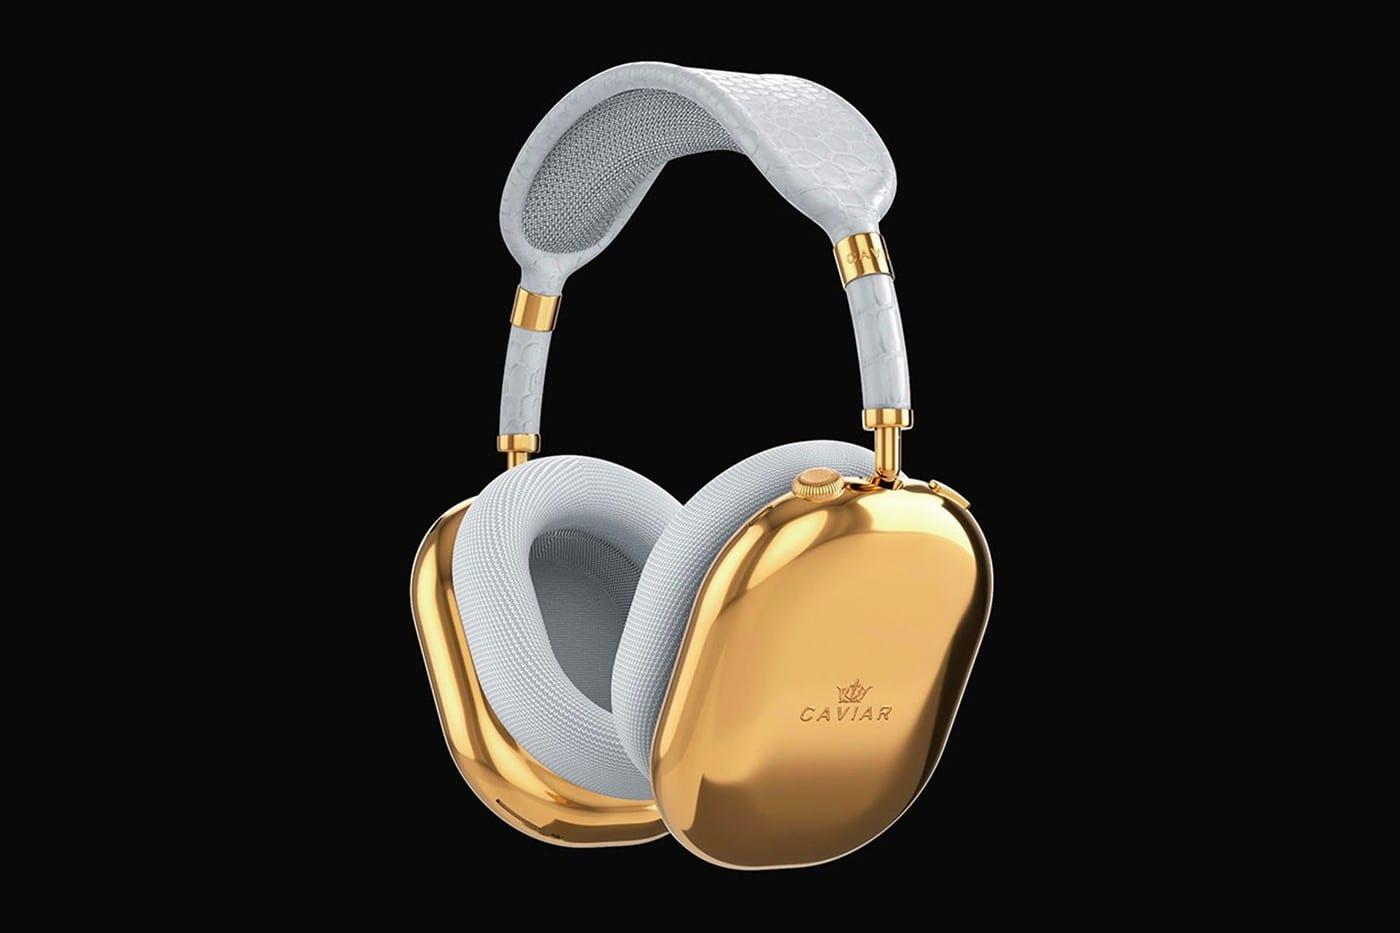 Caviar Gold Apple AirPods Max